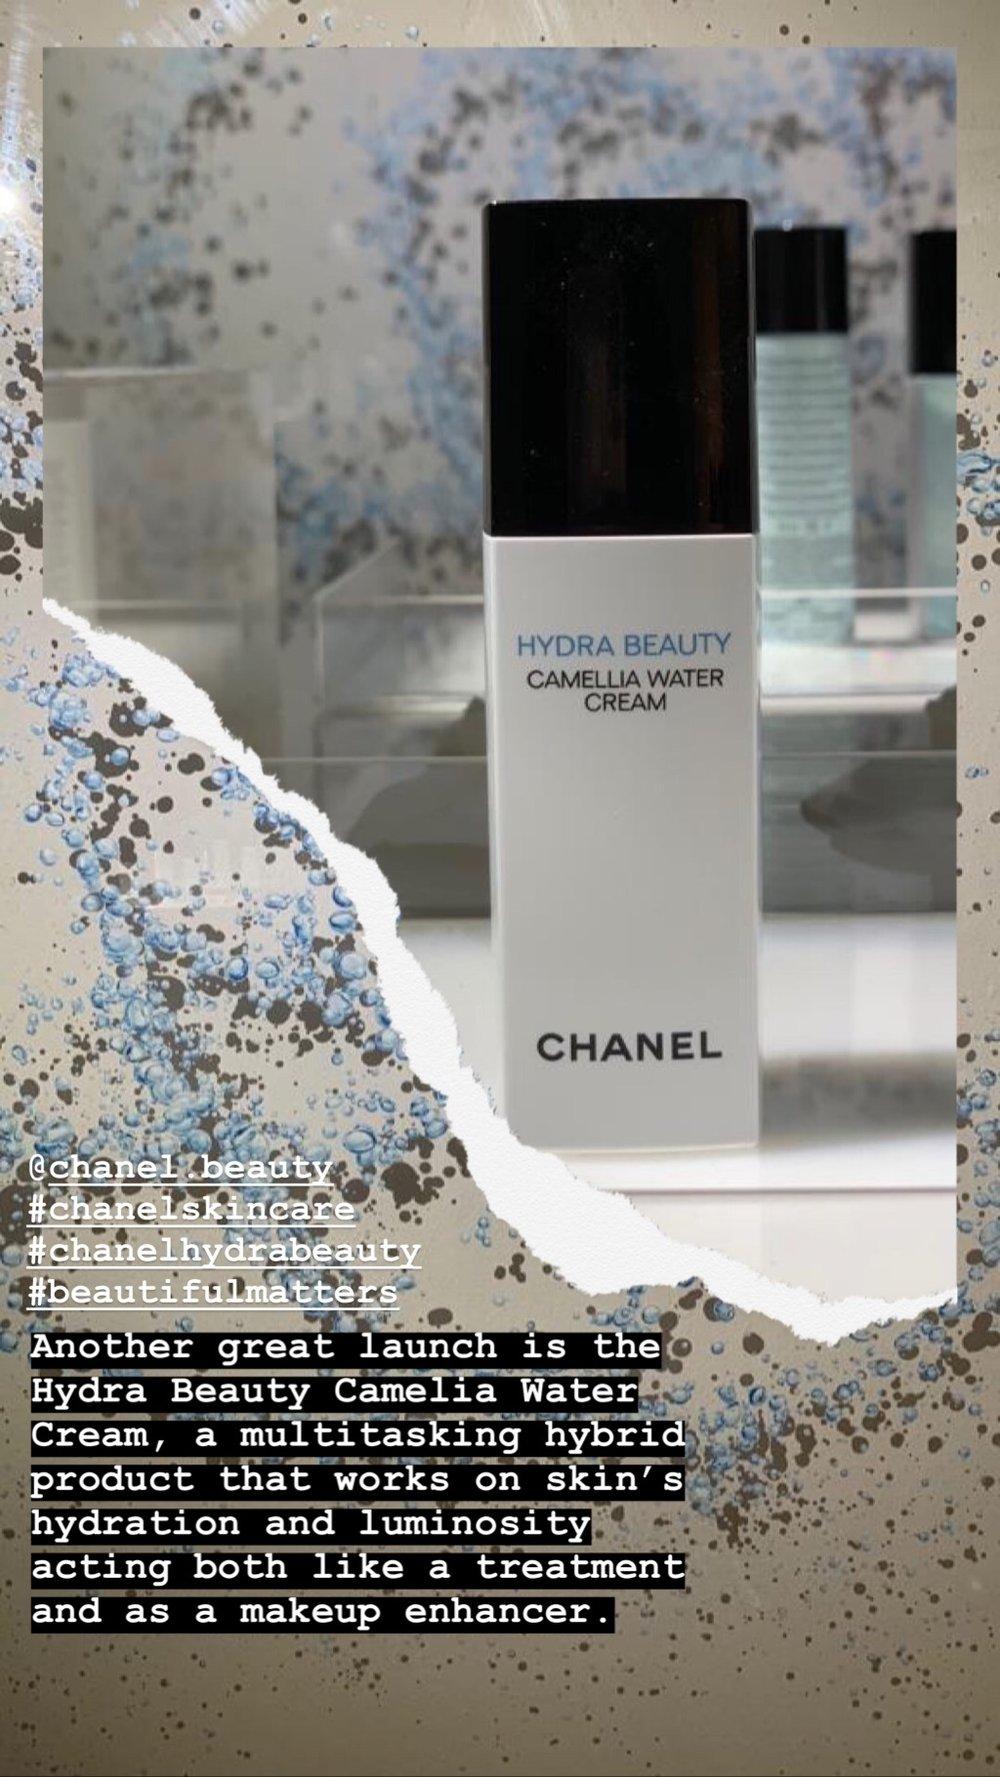 Chanel Hydra beauty Water Cream